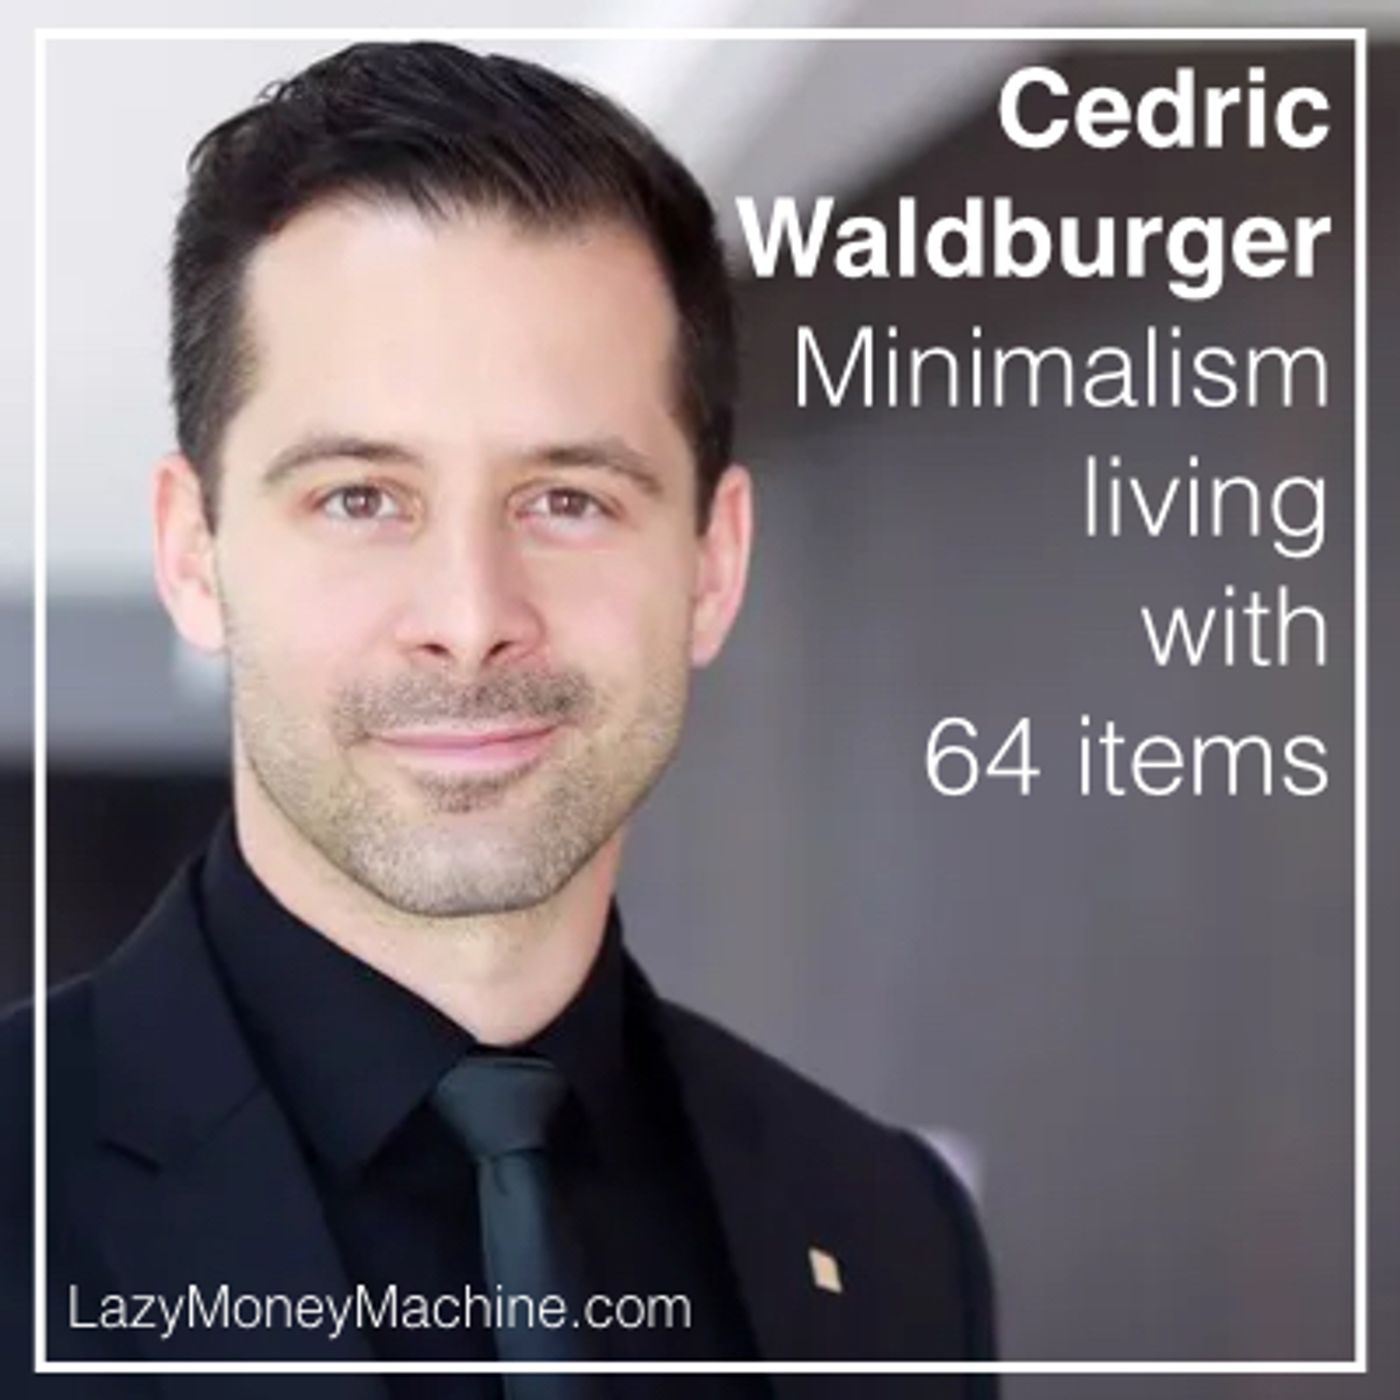 49: Minimalism living with 64 items - Cedric Waldburger